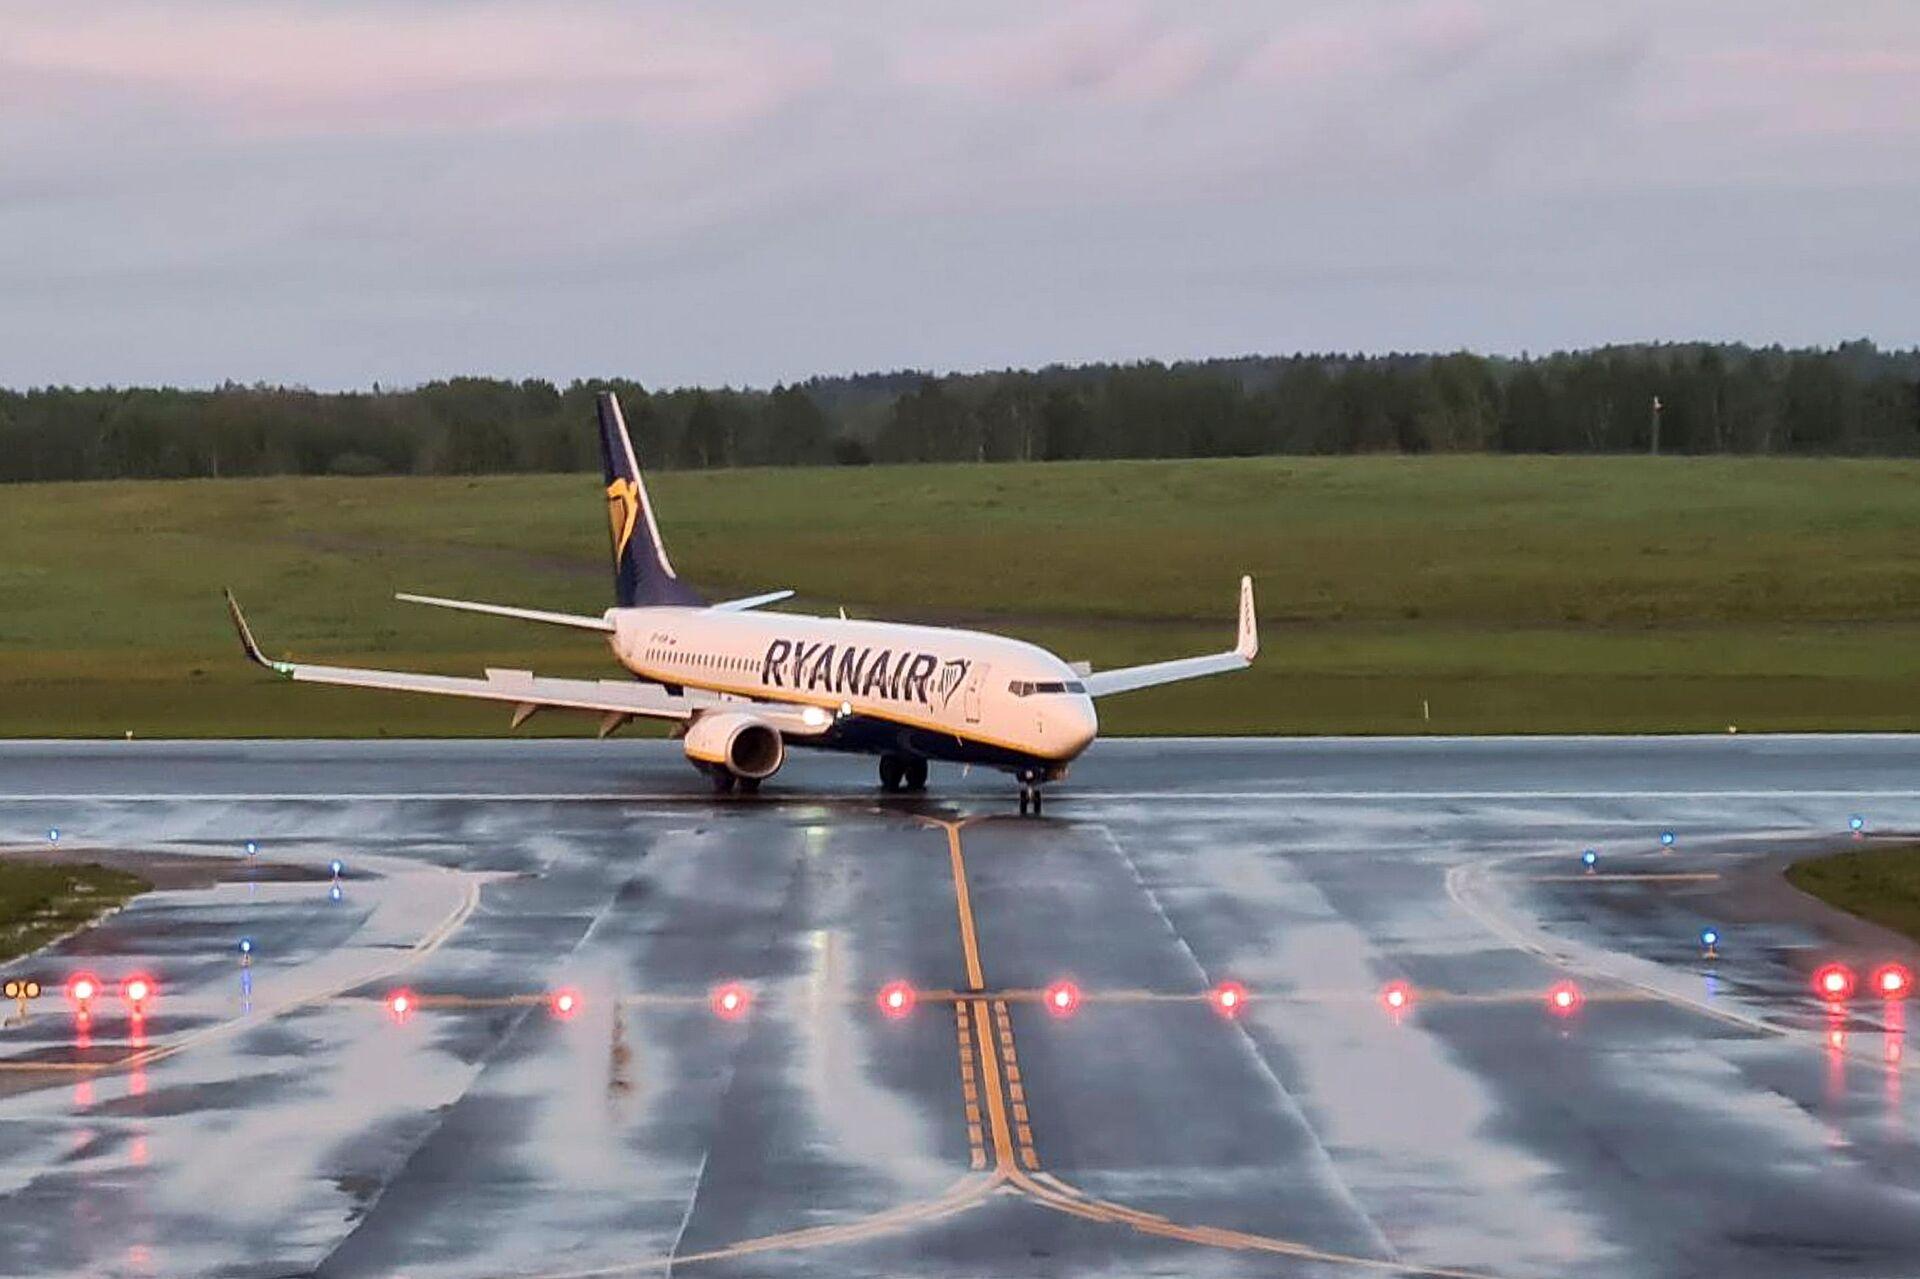 Psaki Refuses to Compare Ryanair Incident in Minsk to Grounding of Ex-Bolivian President's Plane - Sputnik International, 1920, 24.05.2021